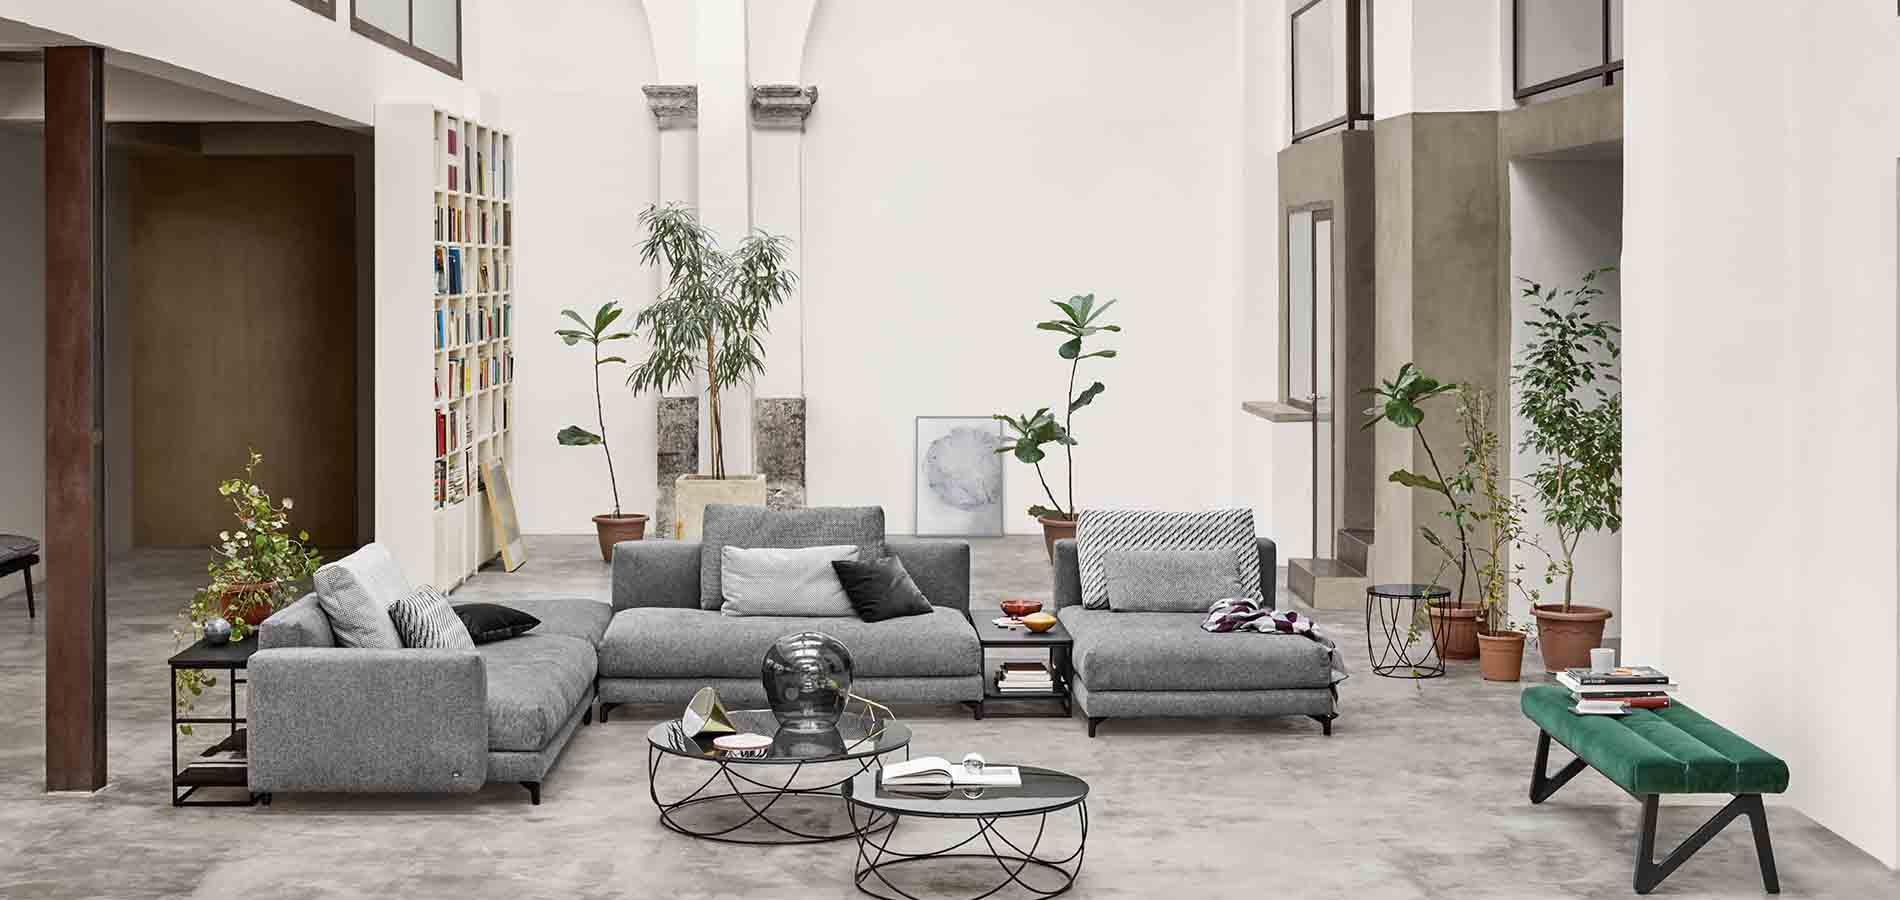 vesuvio-luxury-interiors-02